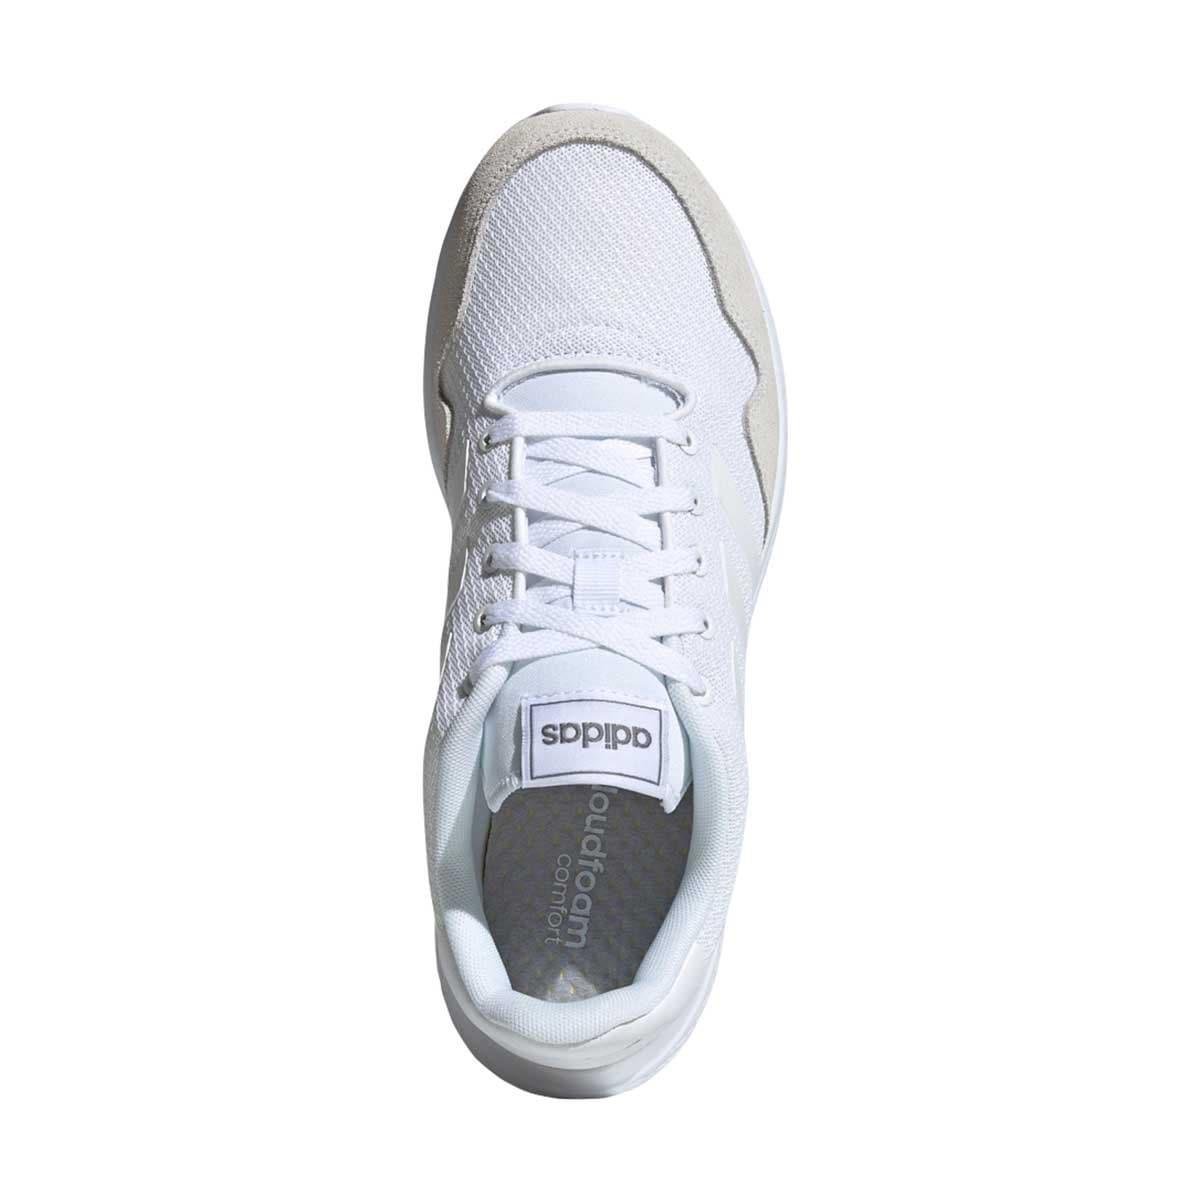 Tenis Running Archivo Running   Blanco Adidas - Caballero